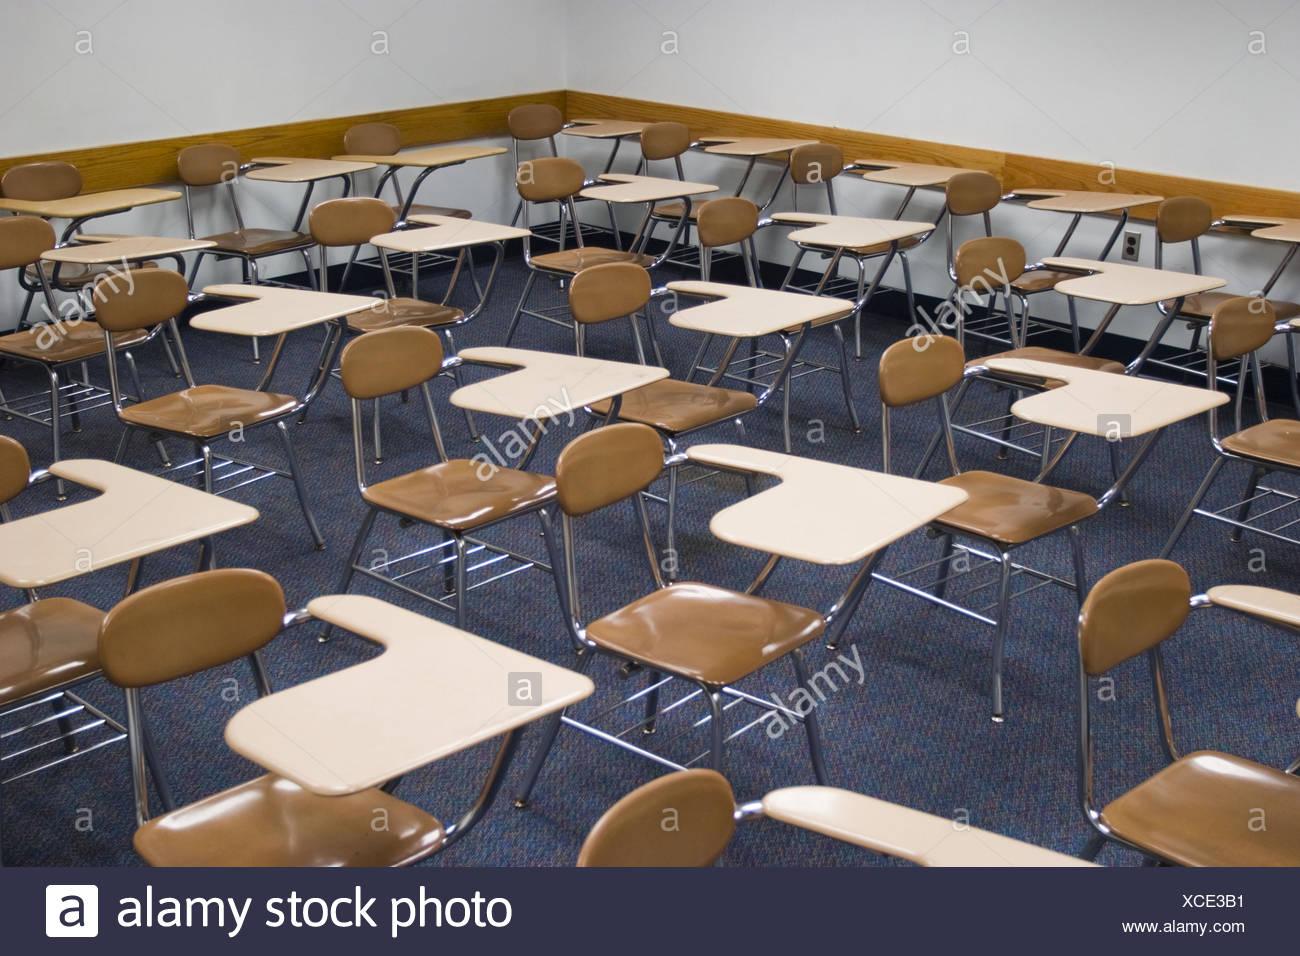 College Classroom With Empty Student Desks Stock Photo 283051749